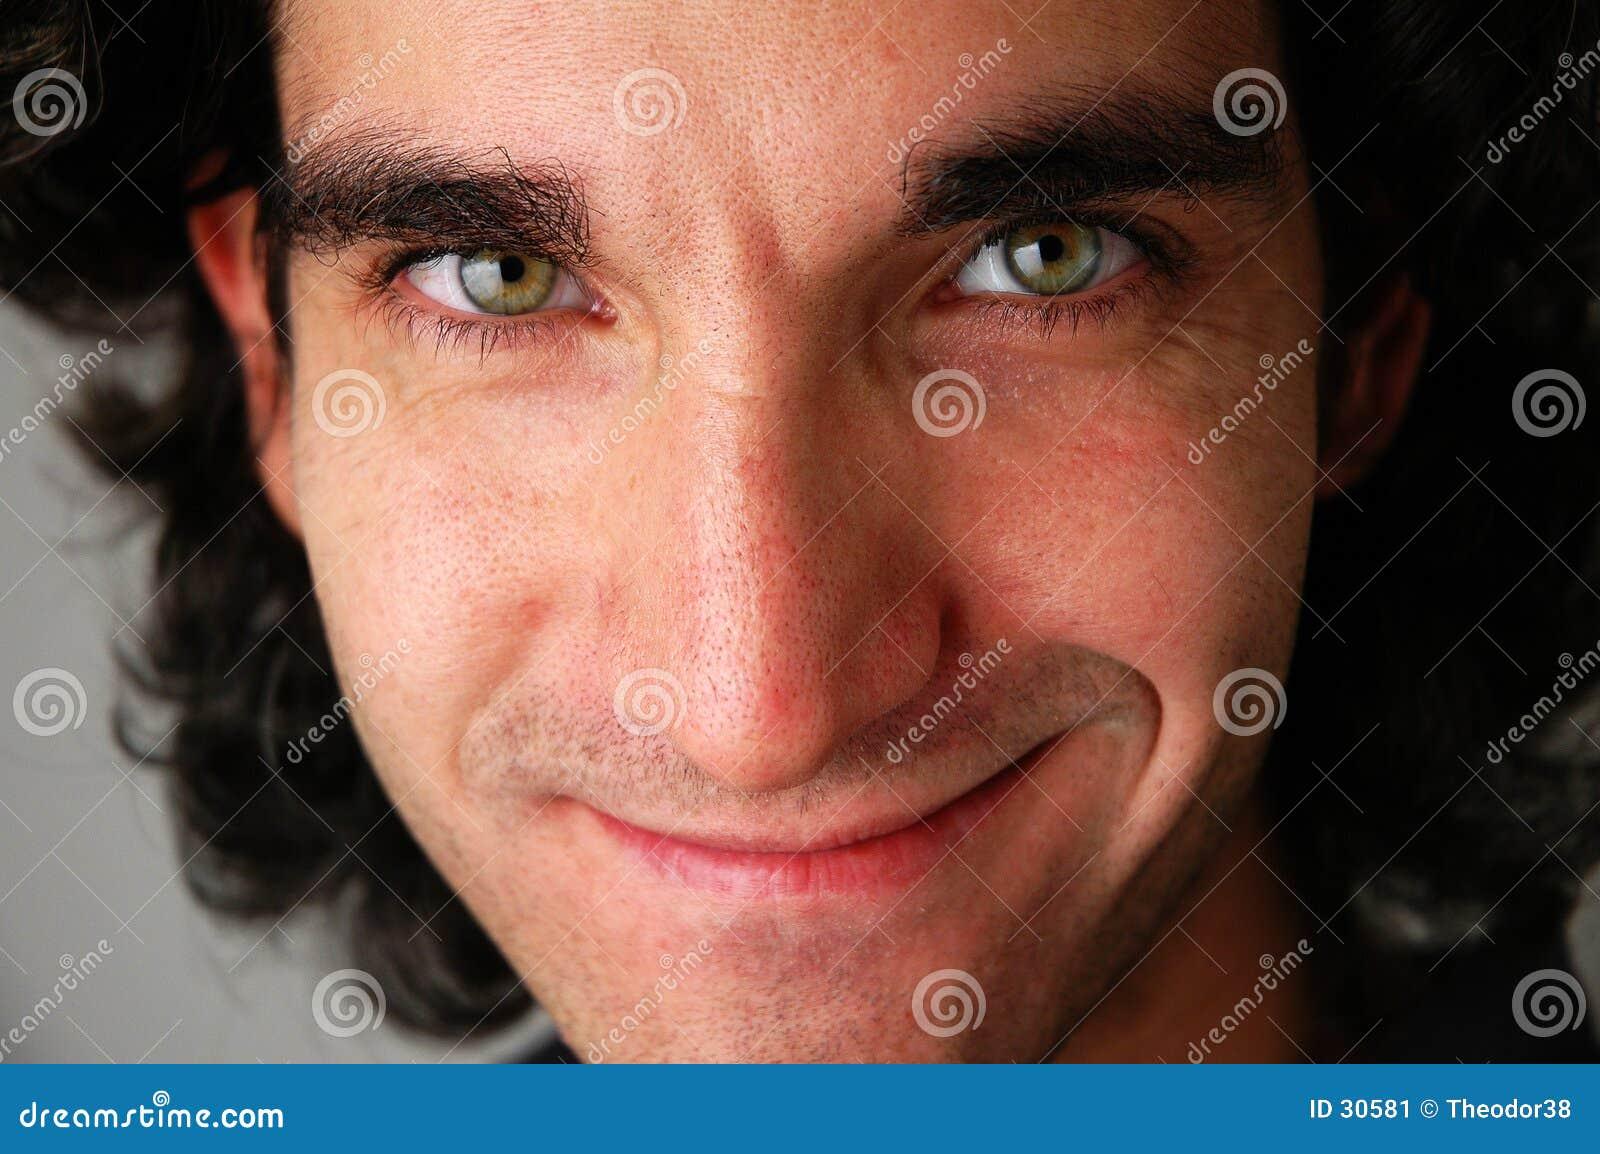 Gesicht close-up-1